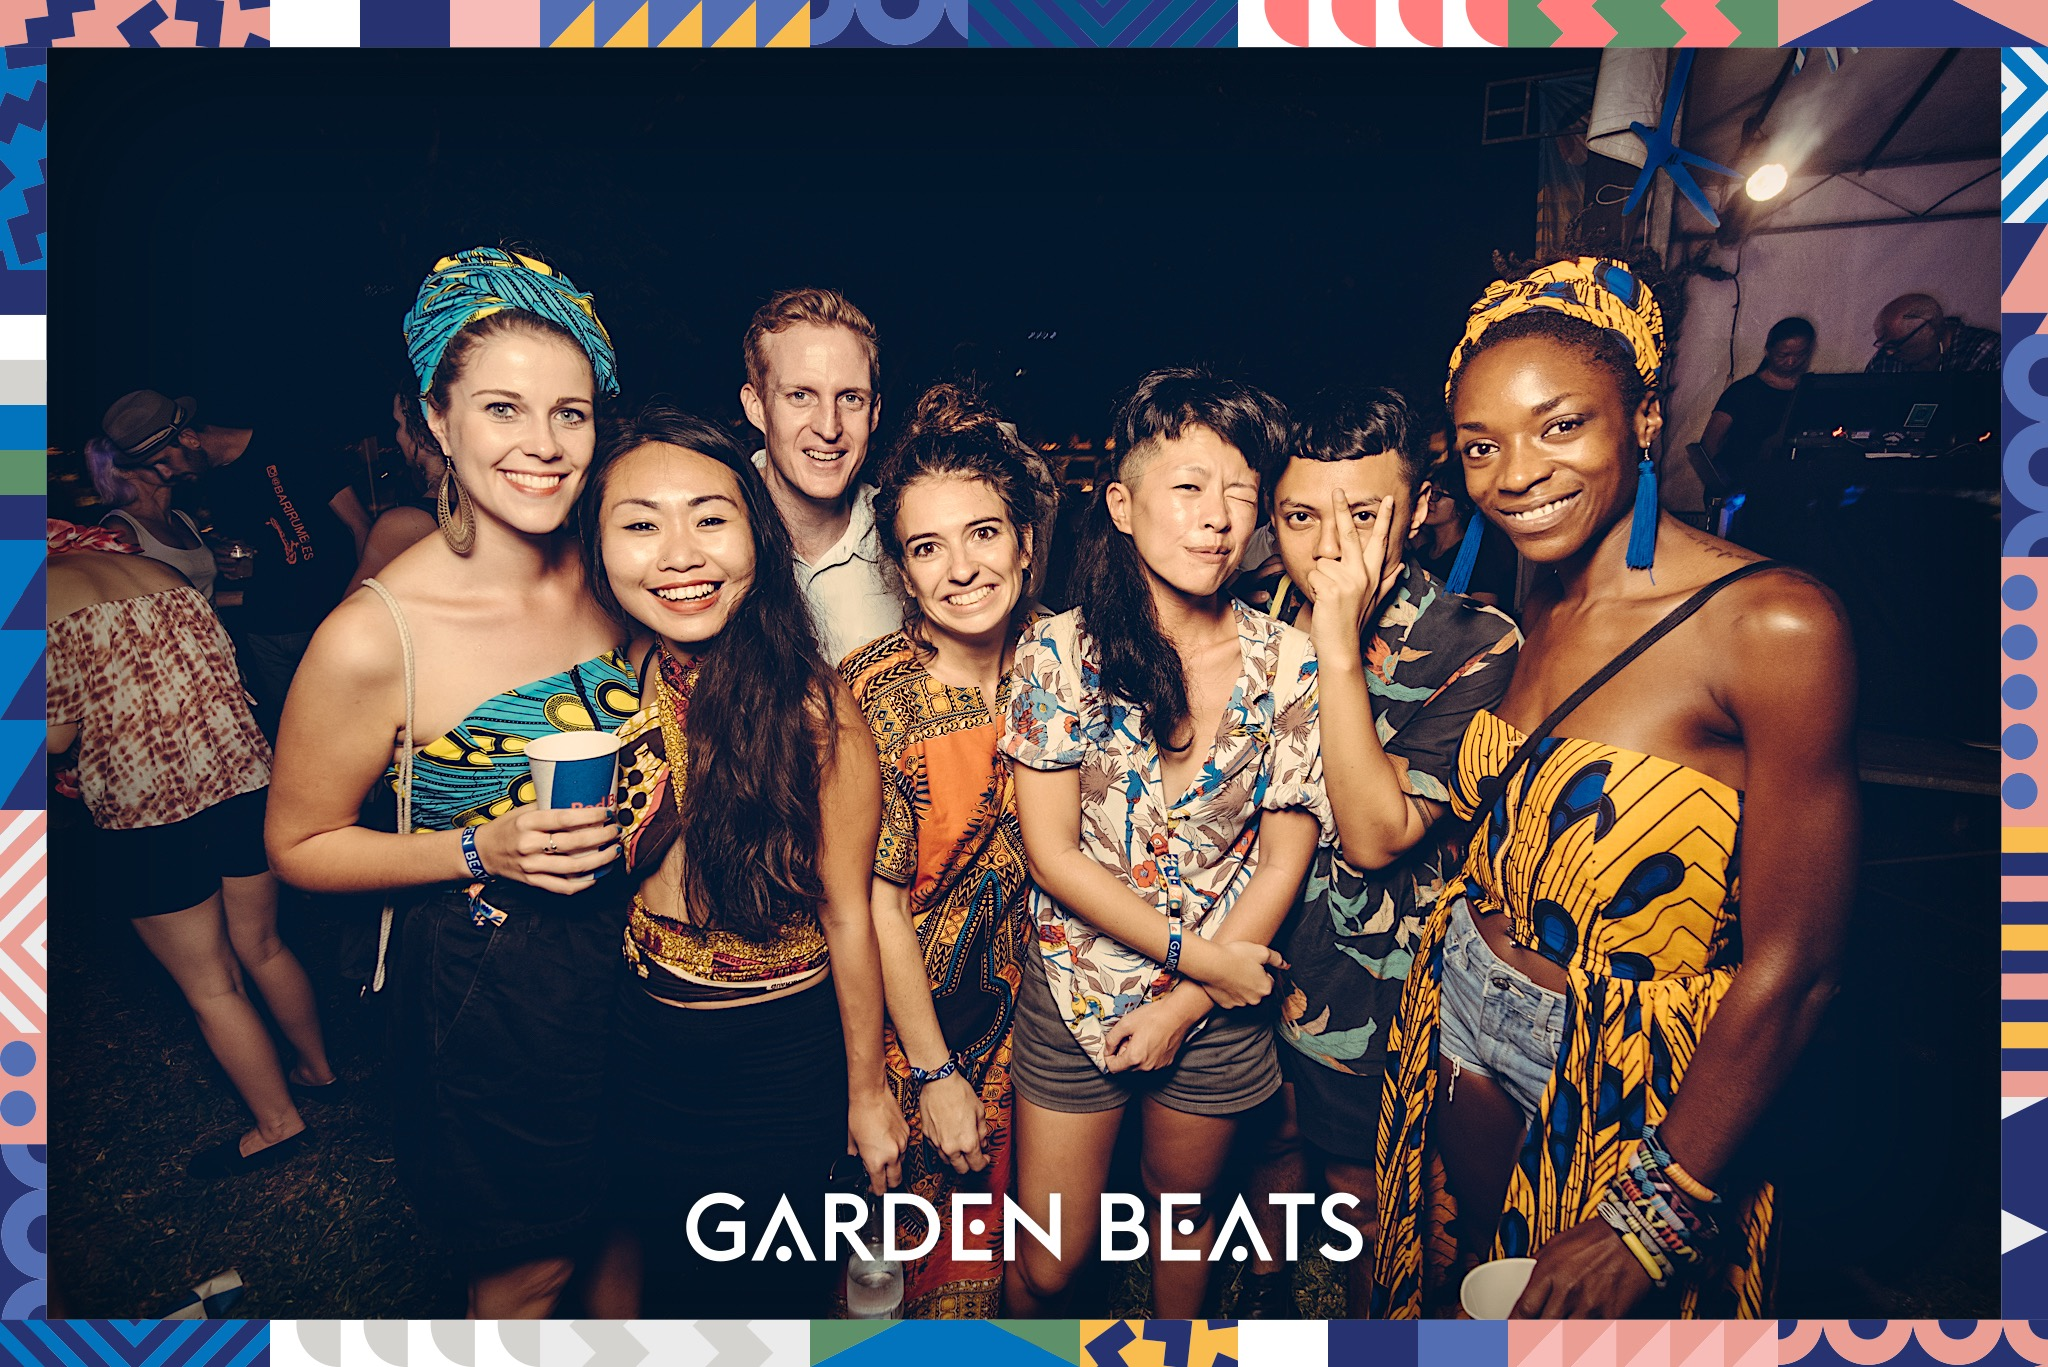 18032017_GardenBeats_Colossal770_WatermarkedGB.jpg